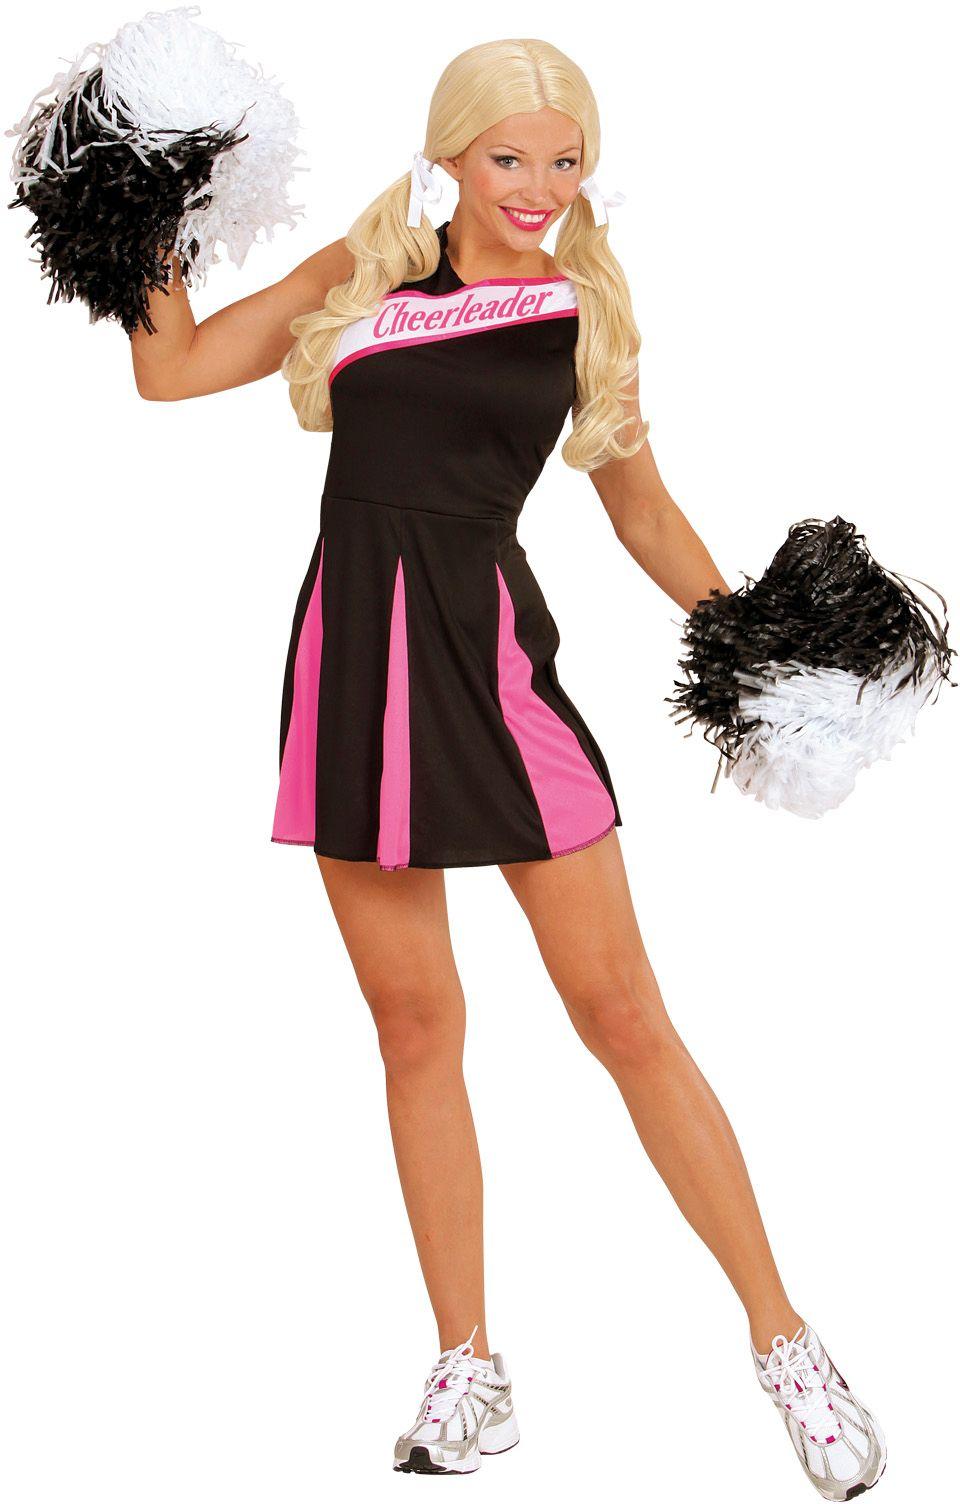 Cheerleader jurkje zwart roze